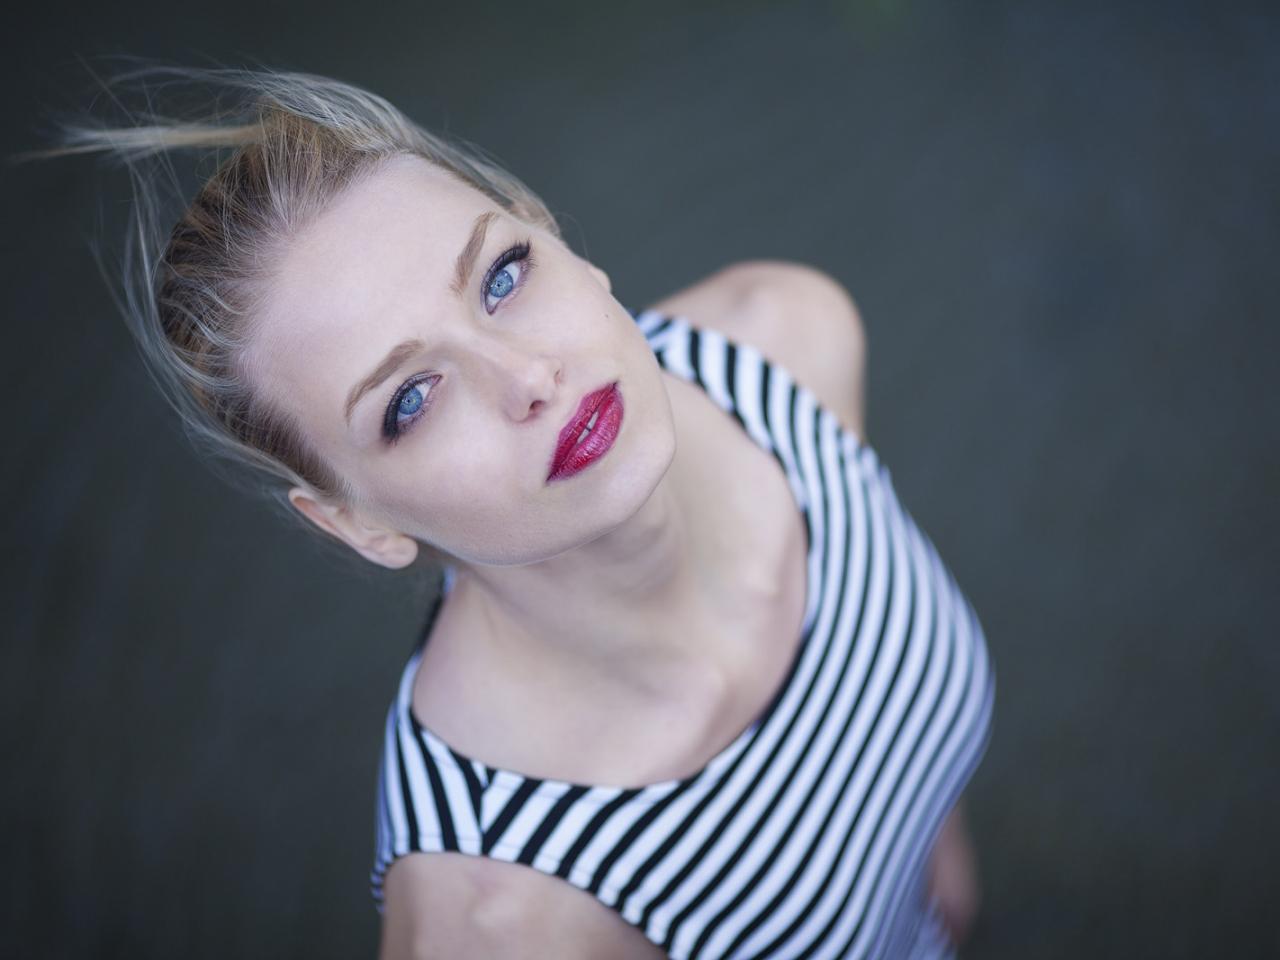 Rubia con ojos azules - 1280x960